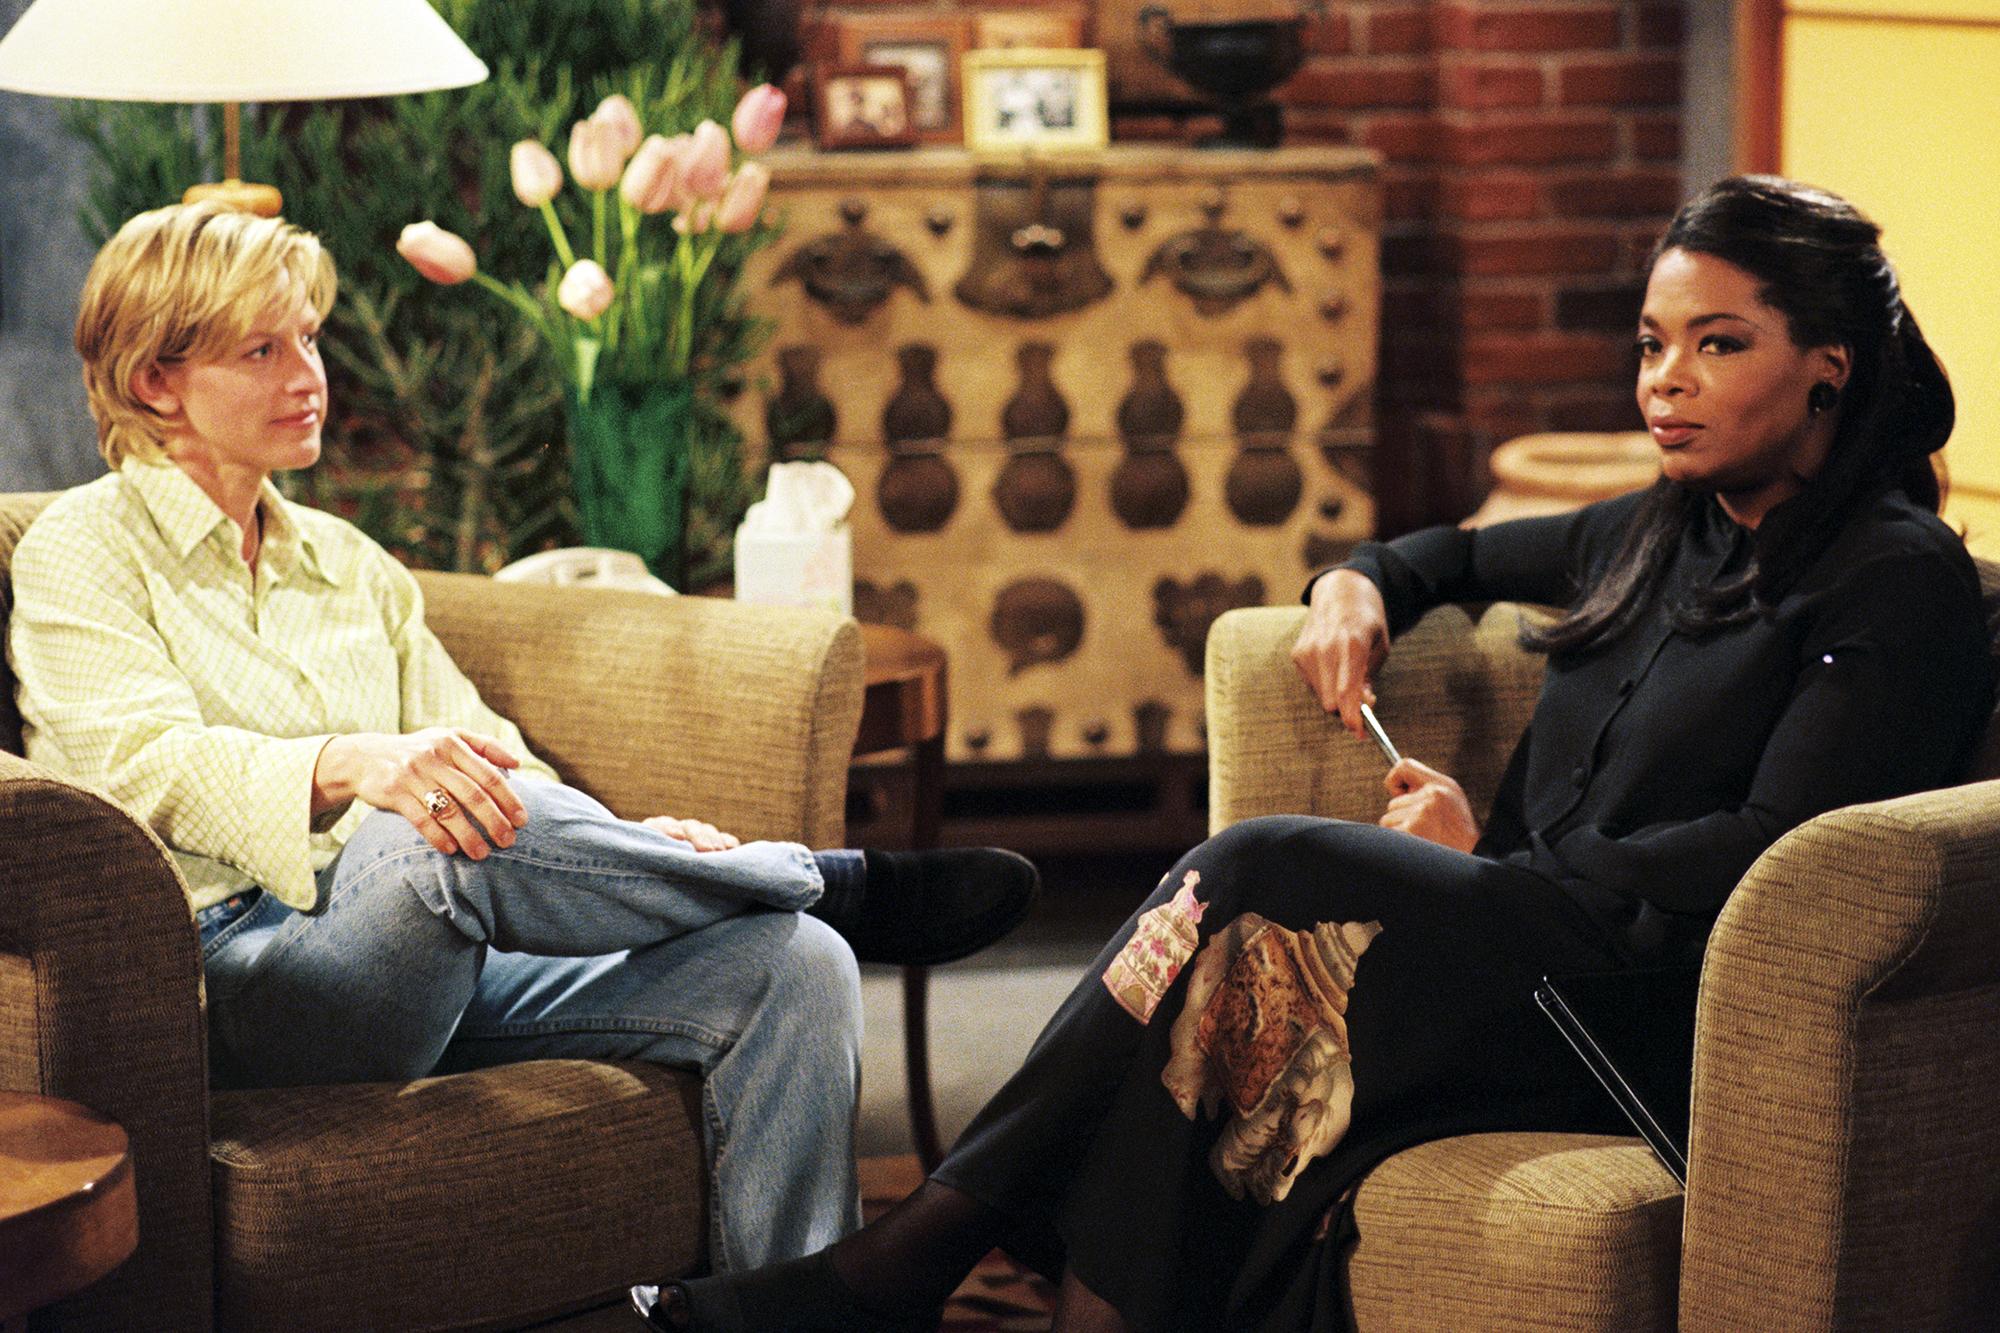 Ellen DeGeneres and Oprah Winfrey in  The Puppy Episode,  which aired April 30, 1997.